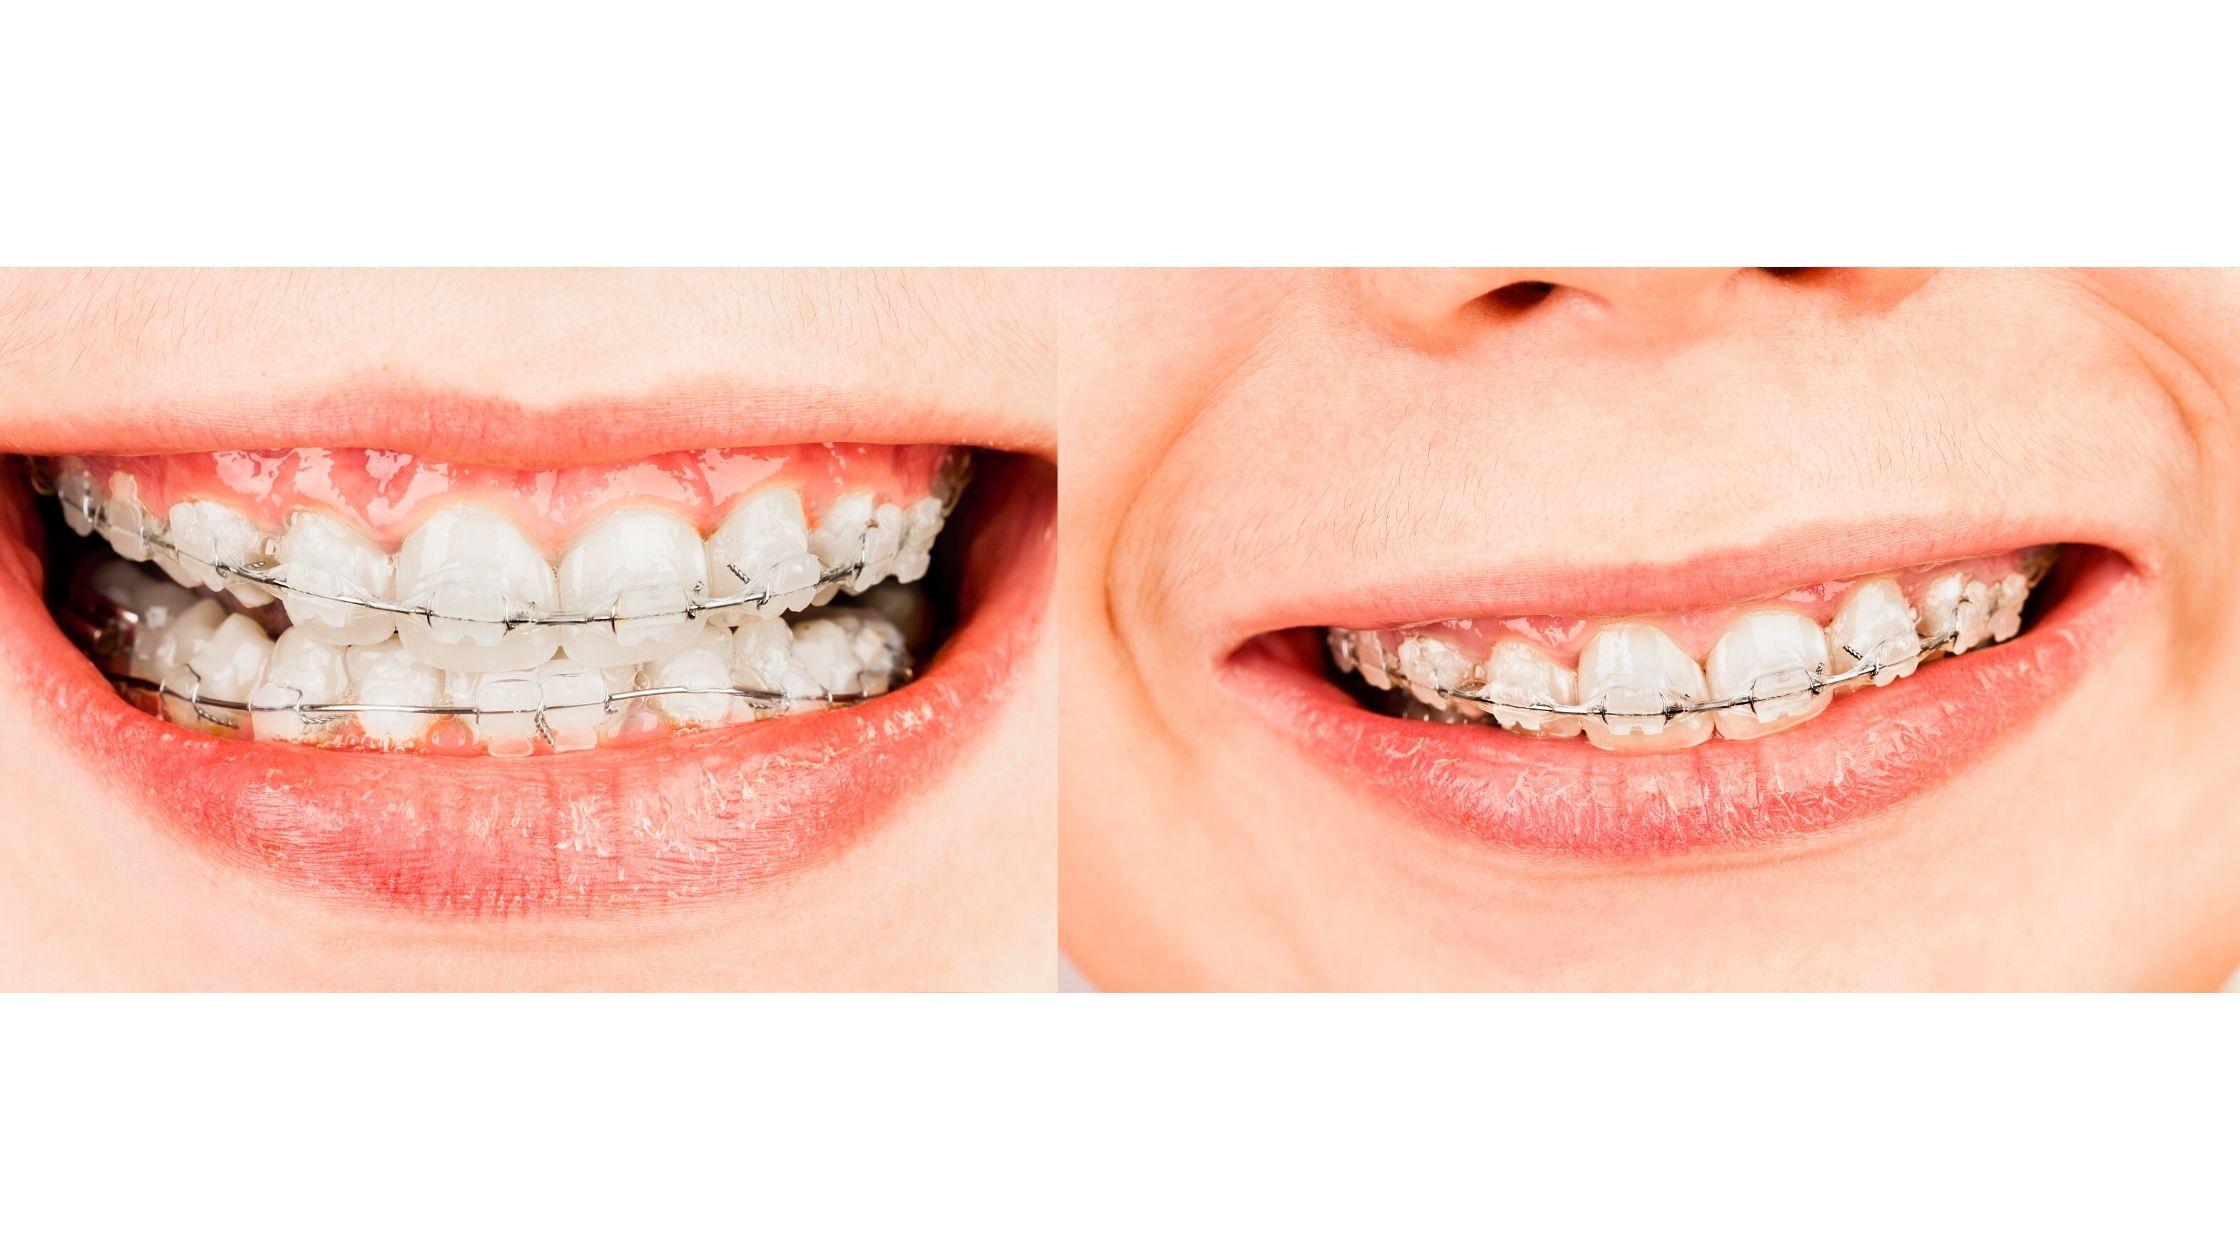 Can braces help fix gummy smile?